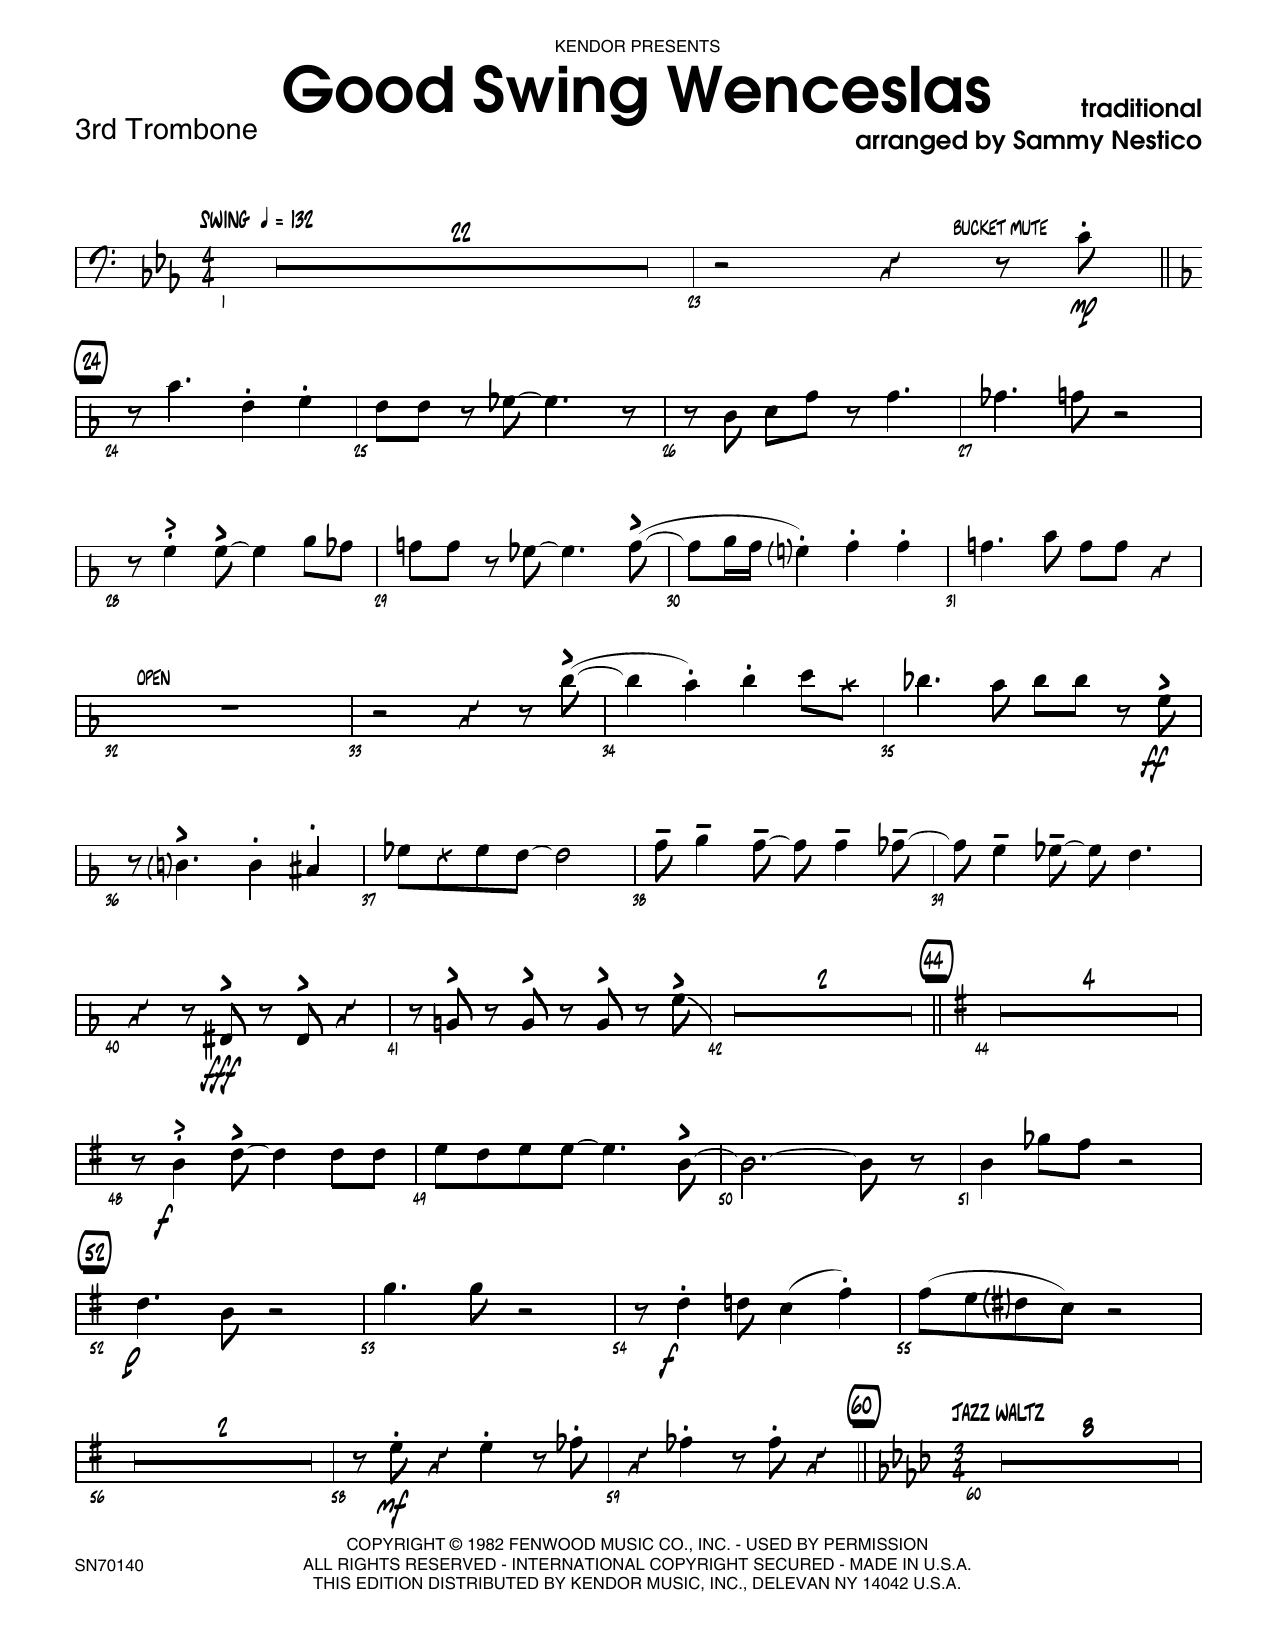 Good Swing Wenceslas - 3rd Trombone Sheet Music